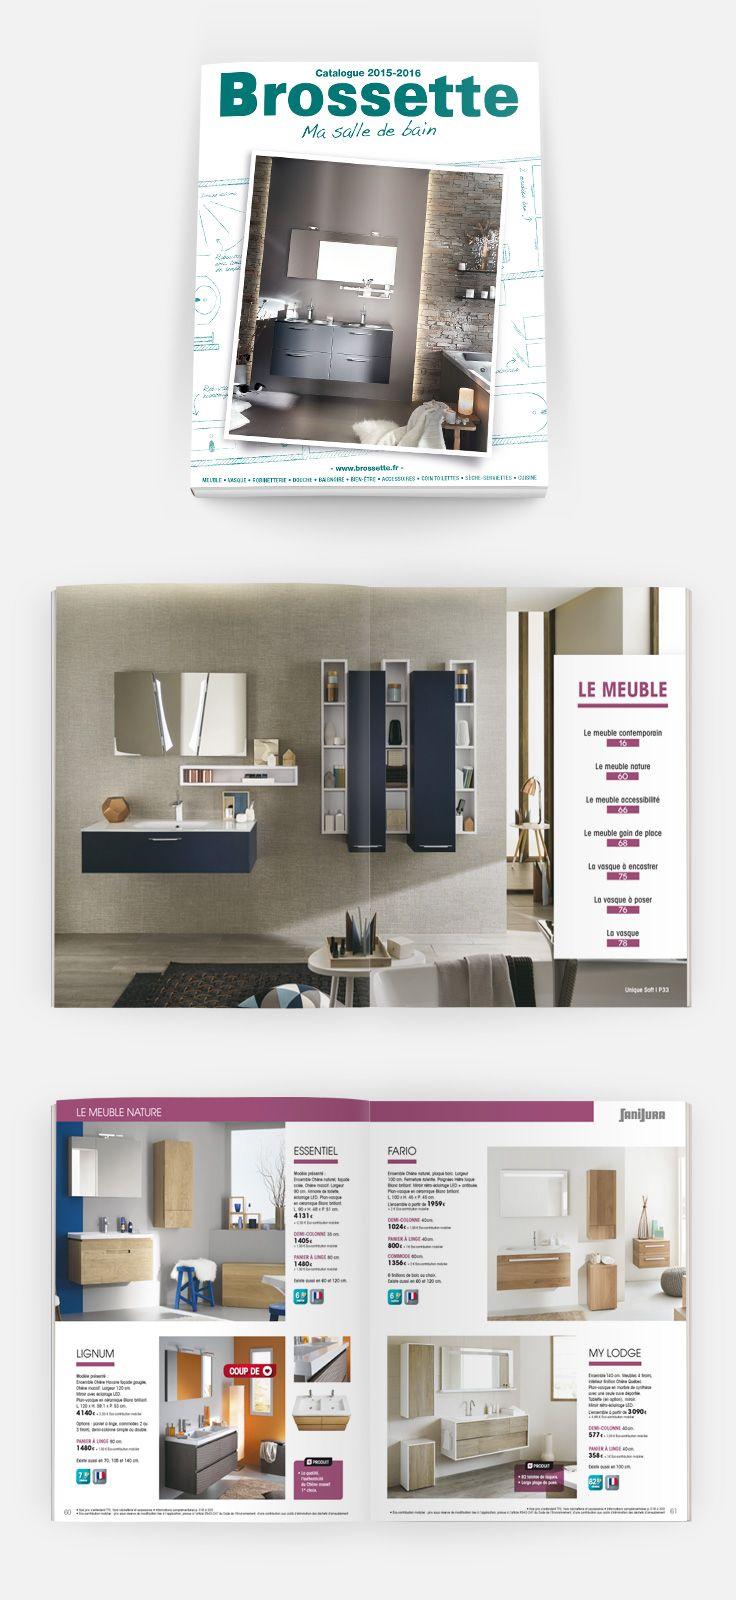 Accessoire Salle De Bain Brossette ~ brossette salle de bain catalogue fabulous paroi fixe pose seule xb